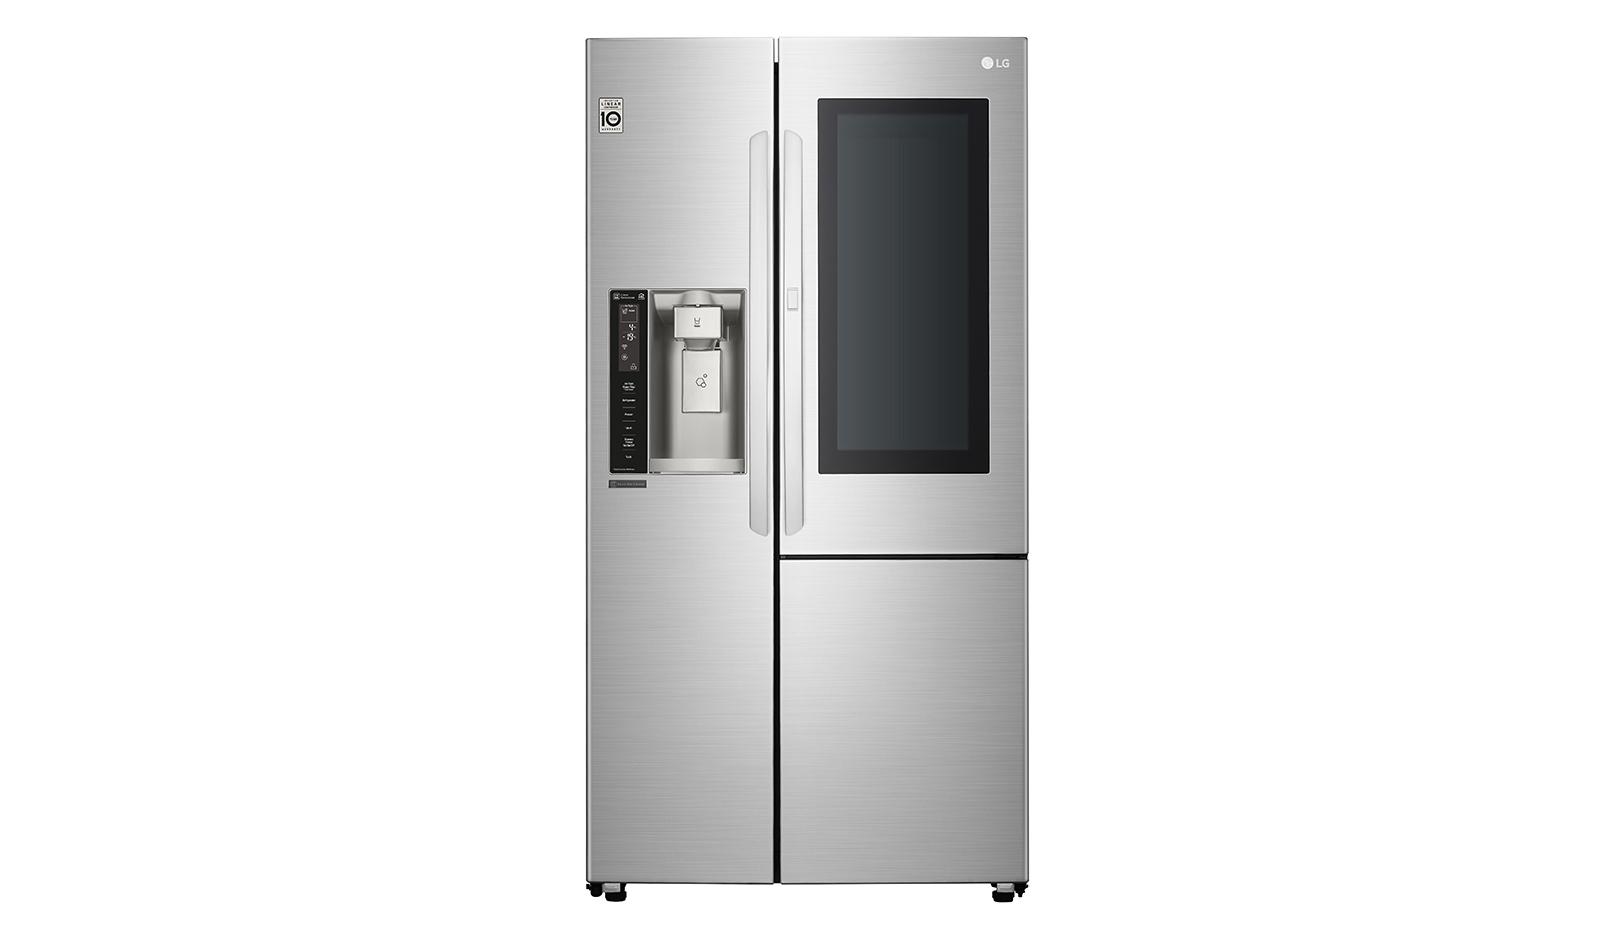 LG 敲敲看門中門冰箱 761L 樂金 星辰銀 電冰箱 GR-QPL88SV